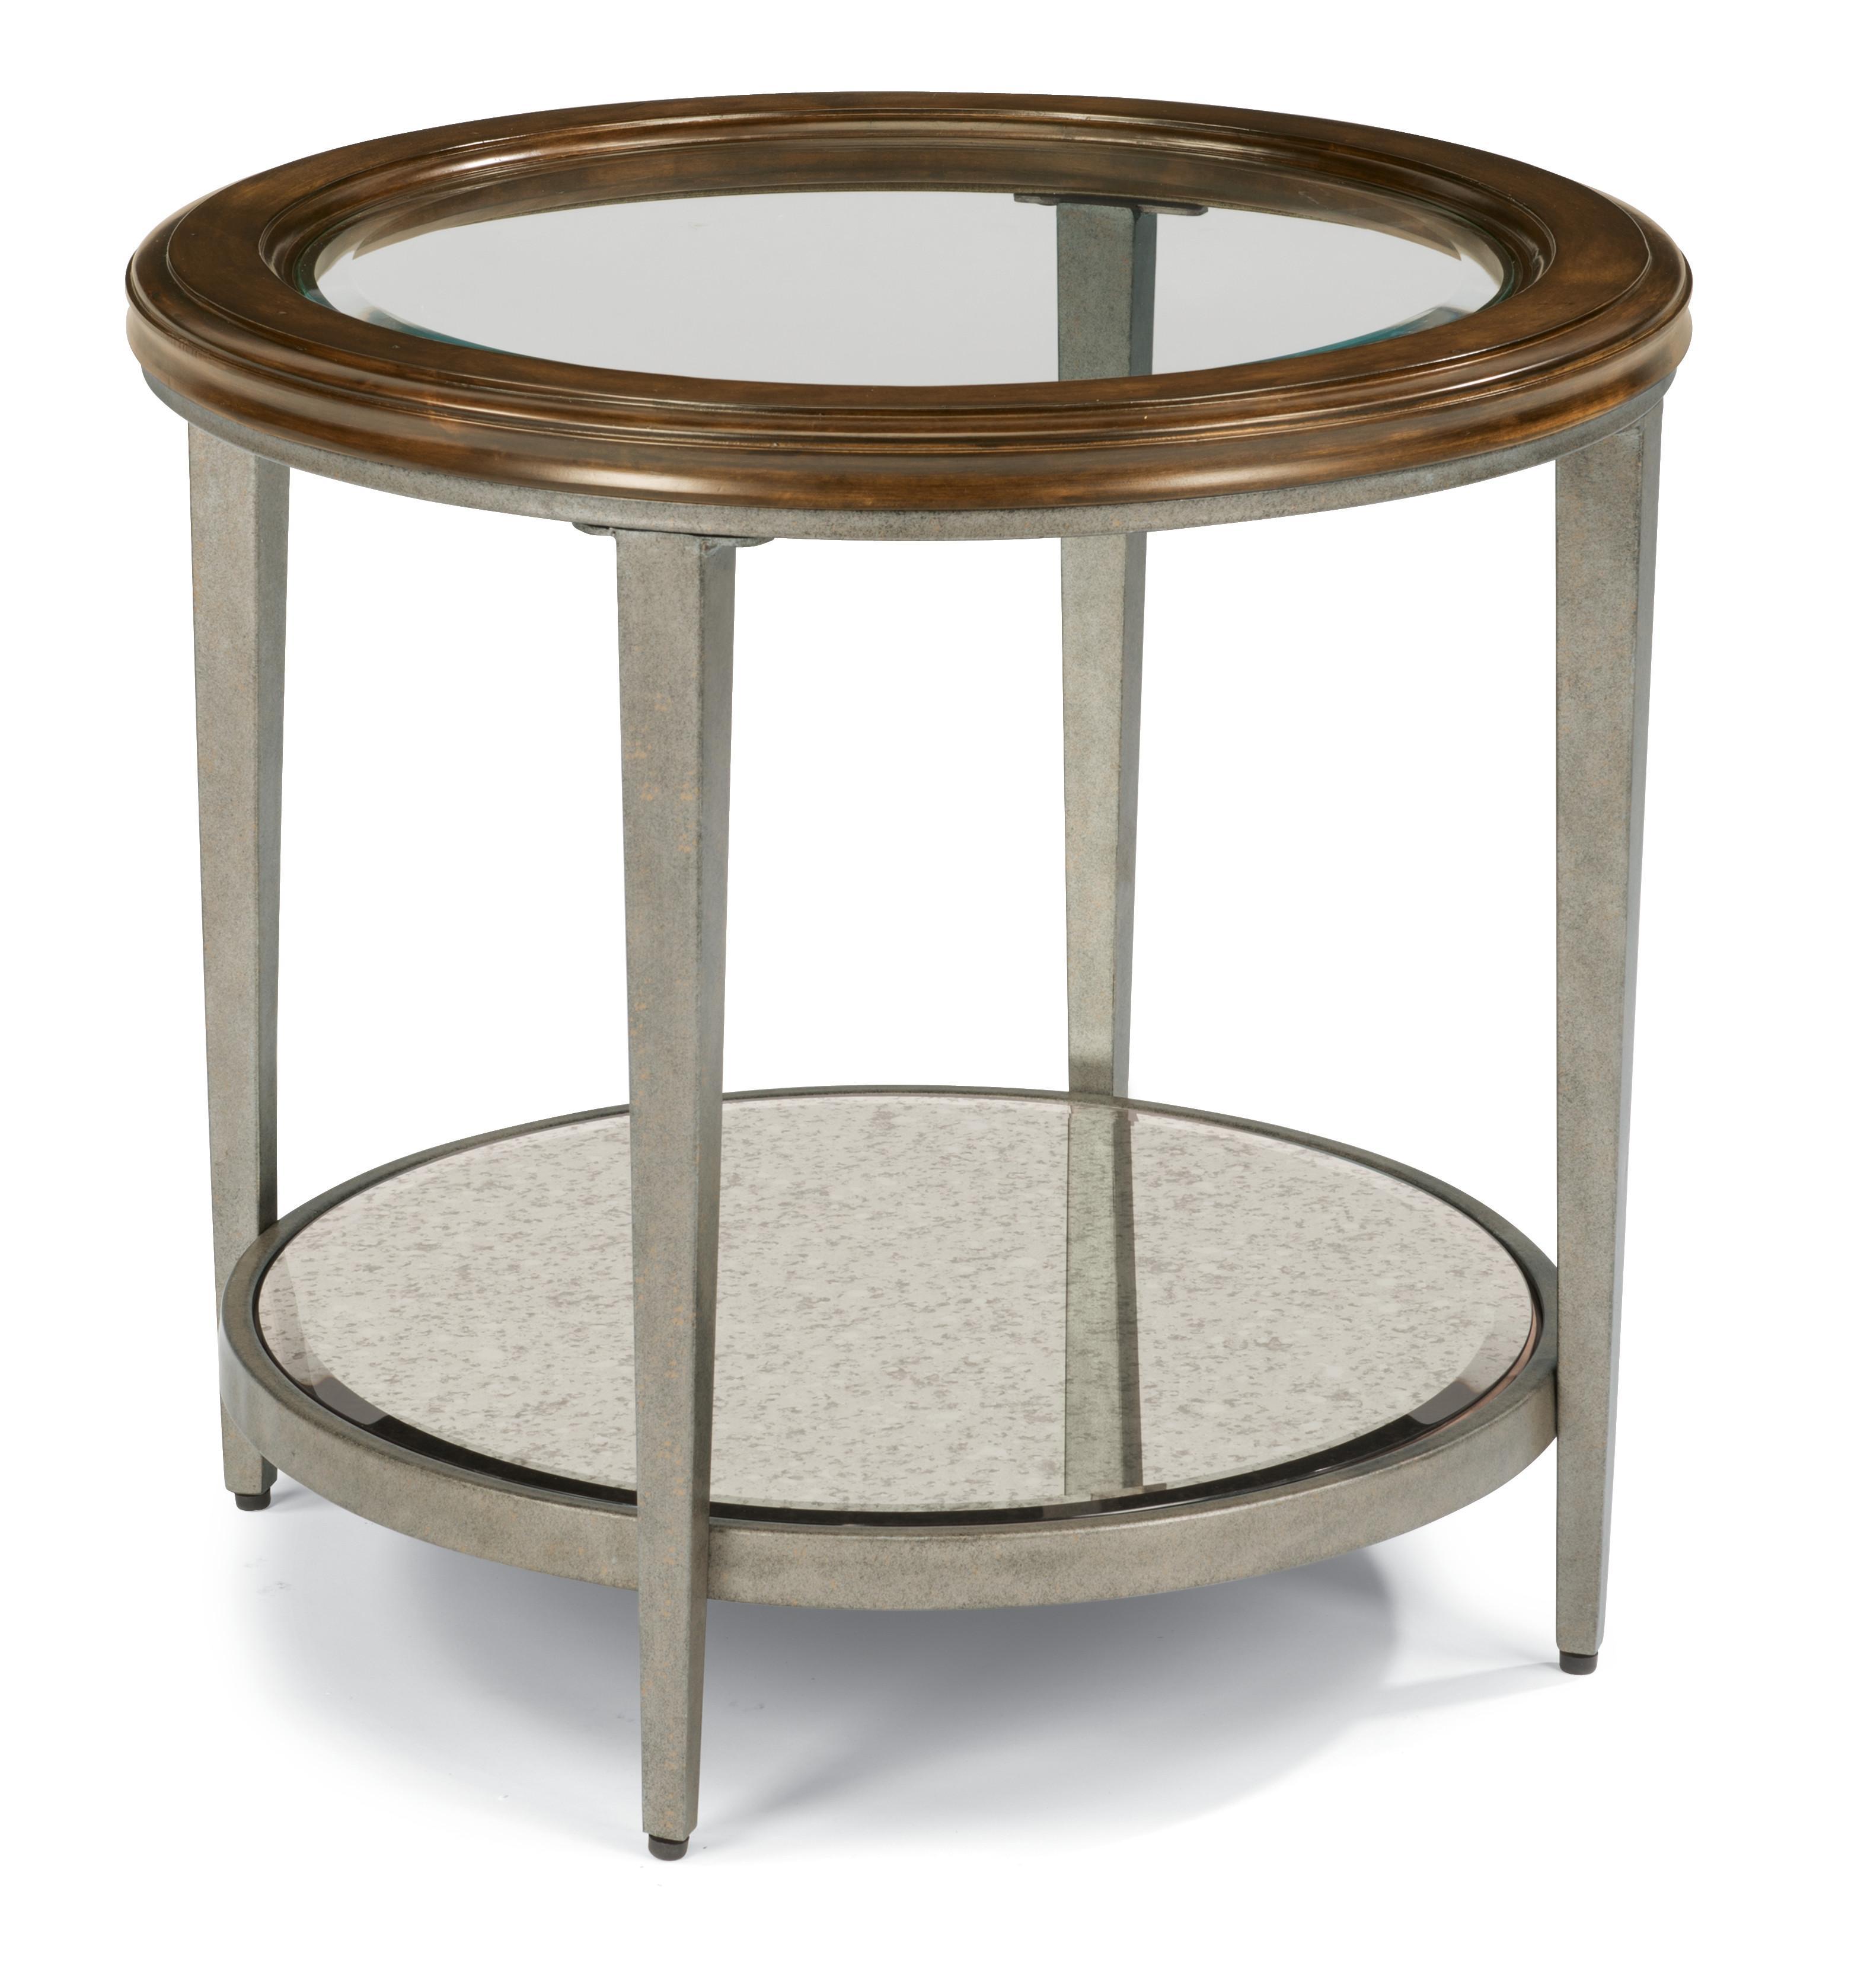 Flexsteel Patina Lamp Table - Item Number: 6727-02